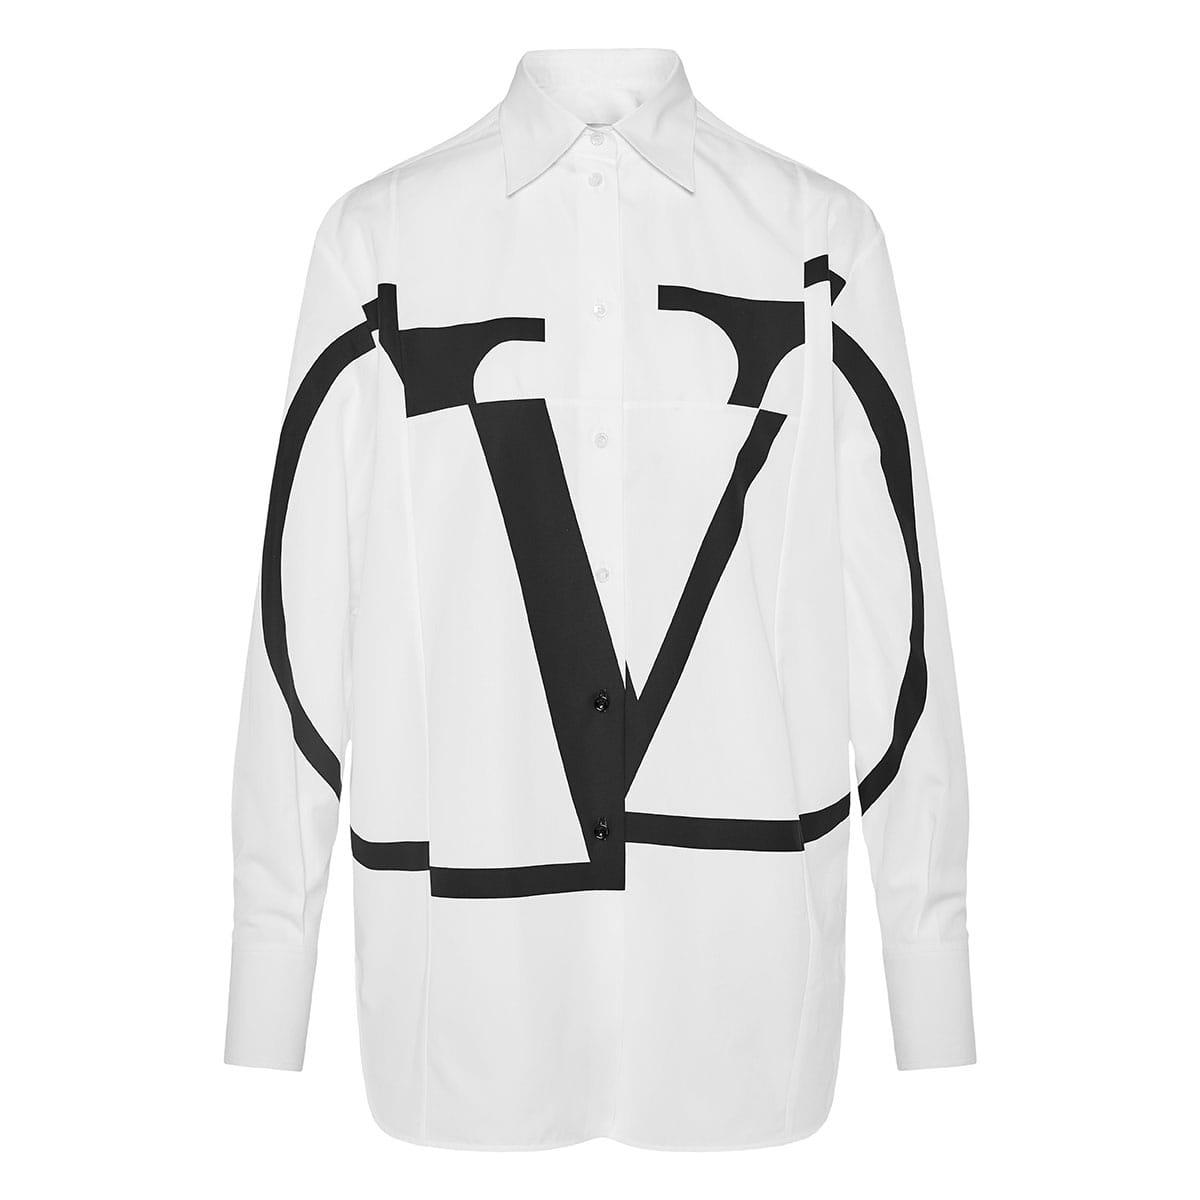 V-logo oversized shirt